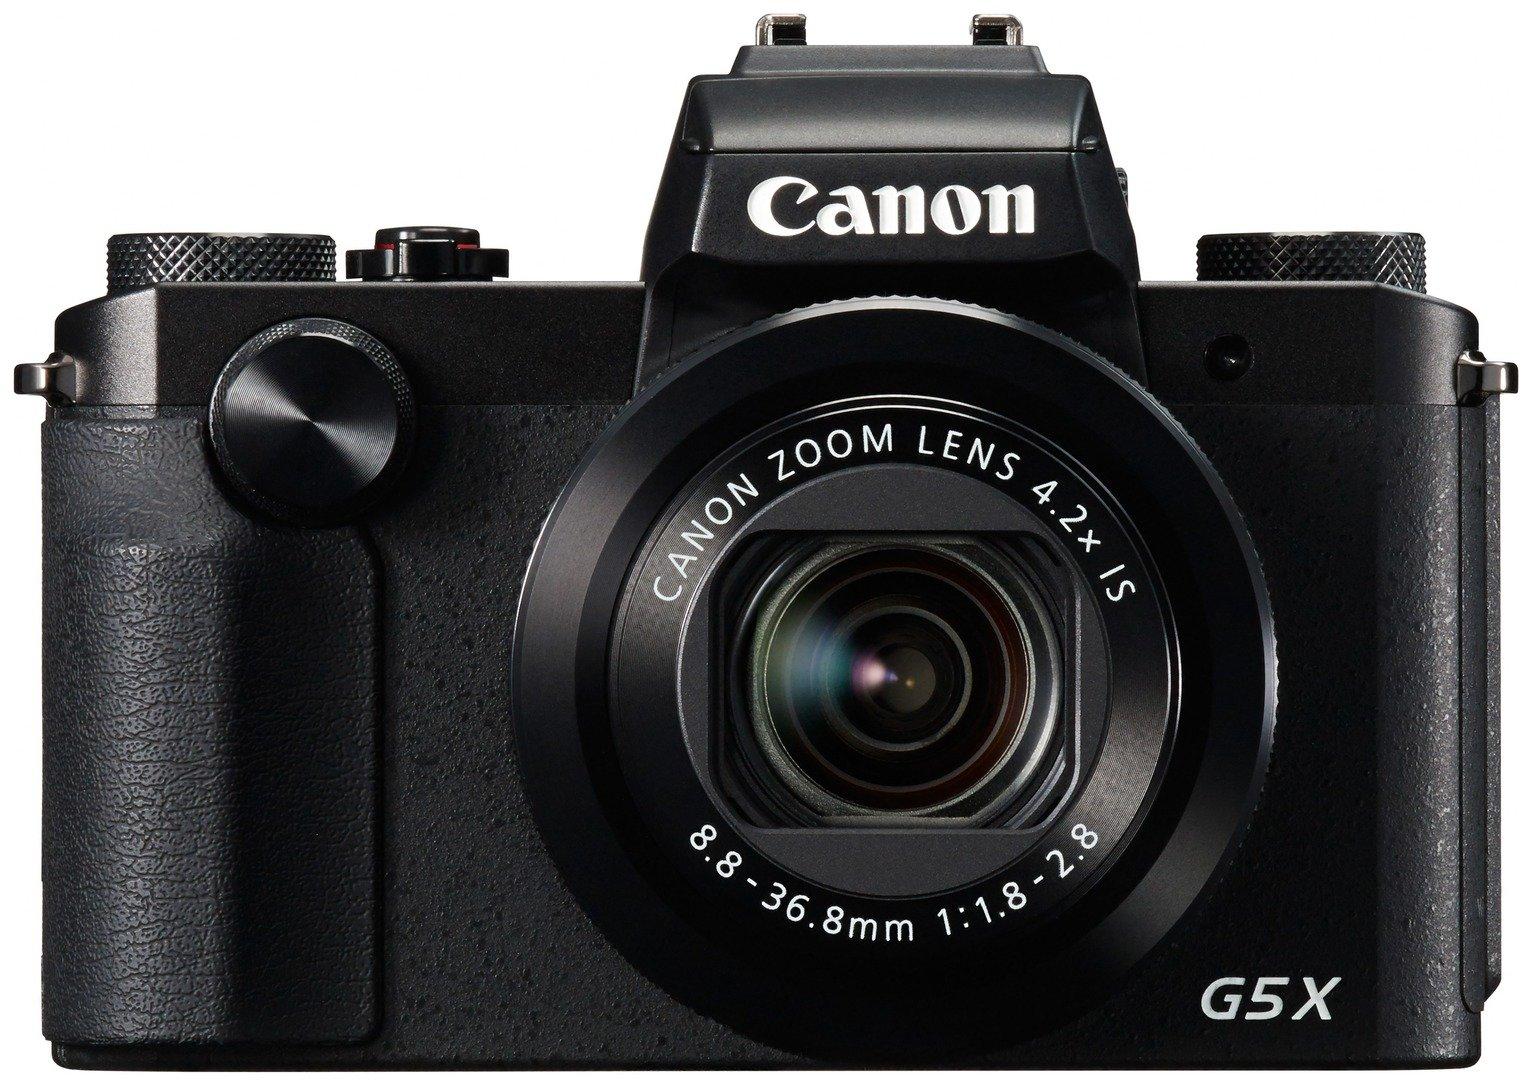 Canon Powershot G5X Premium Compact Camera.